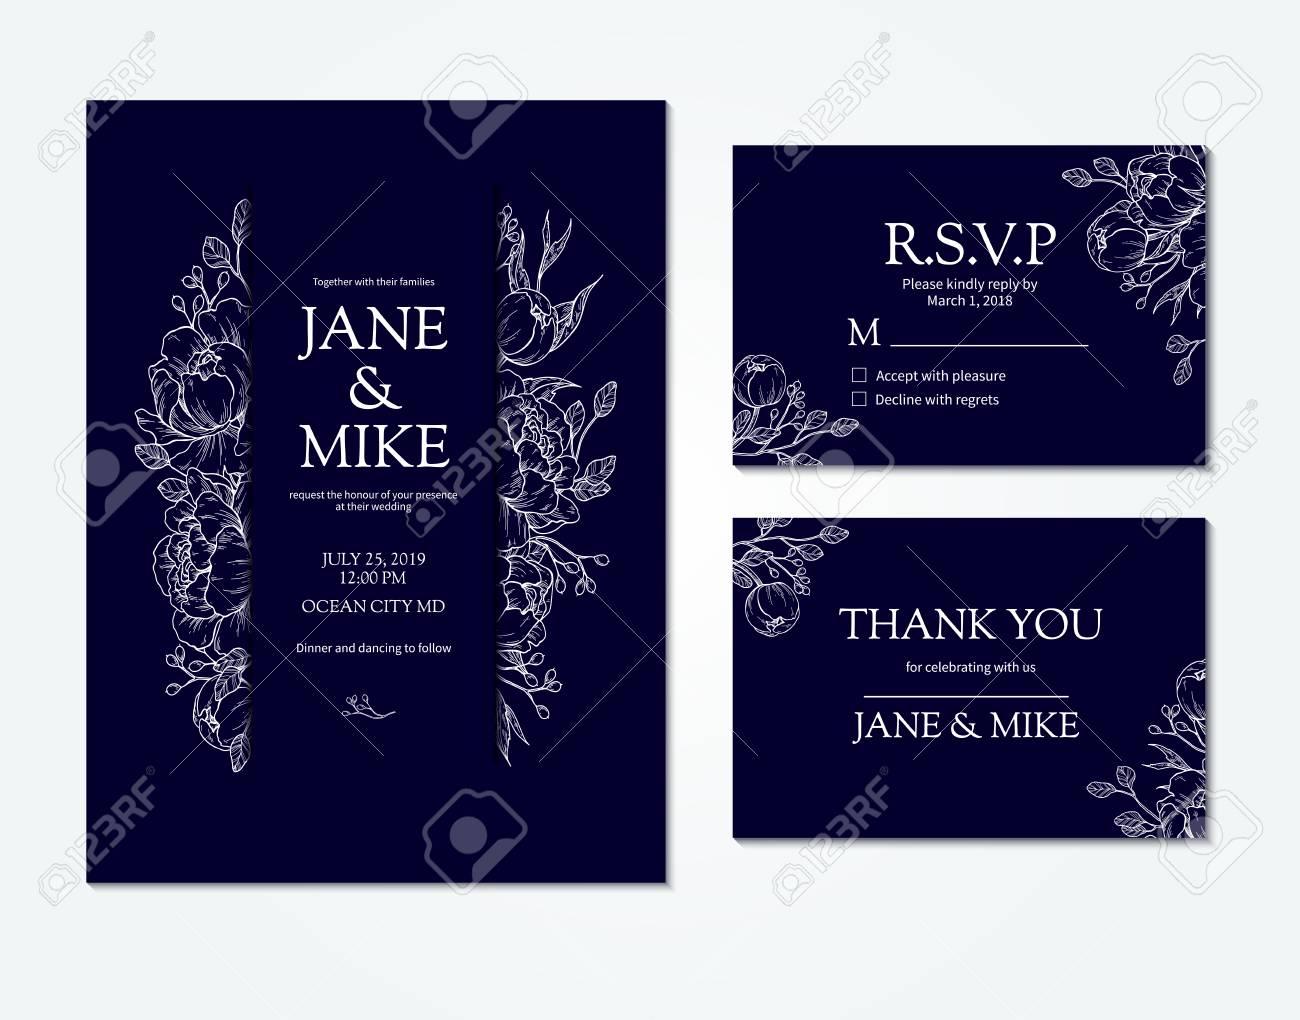 Dark Blue Wedding Invitation Card Template With Vector Peony